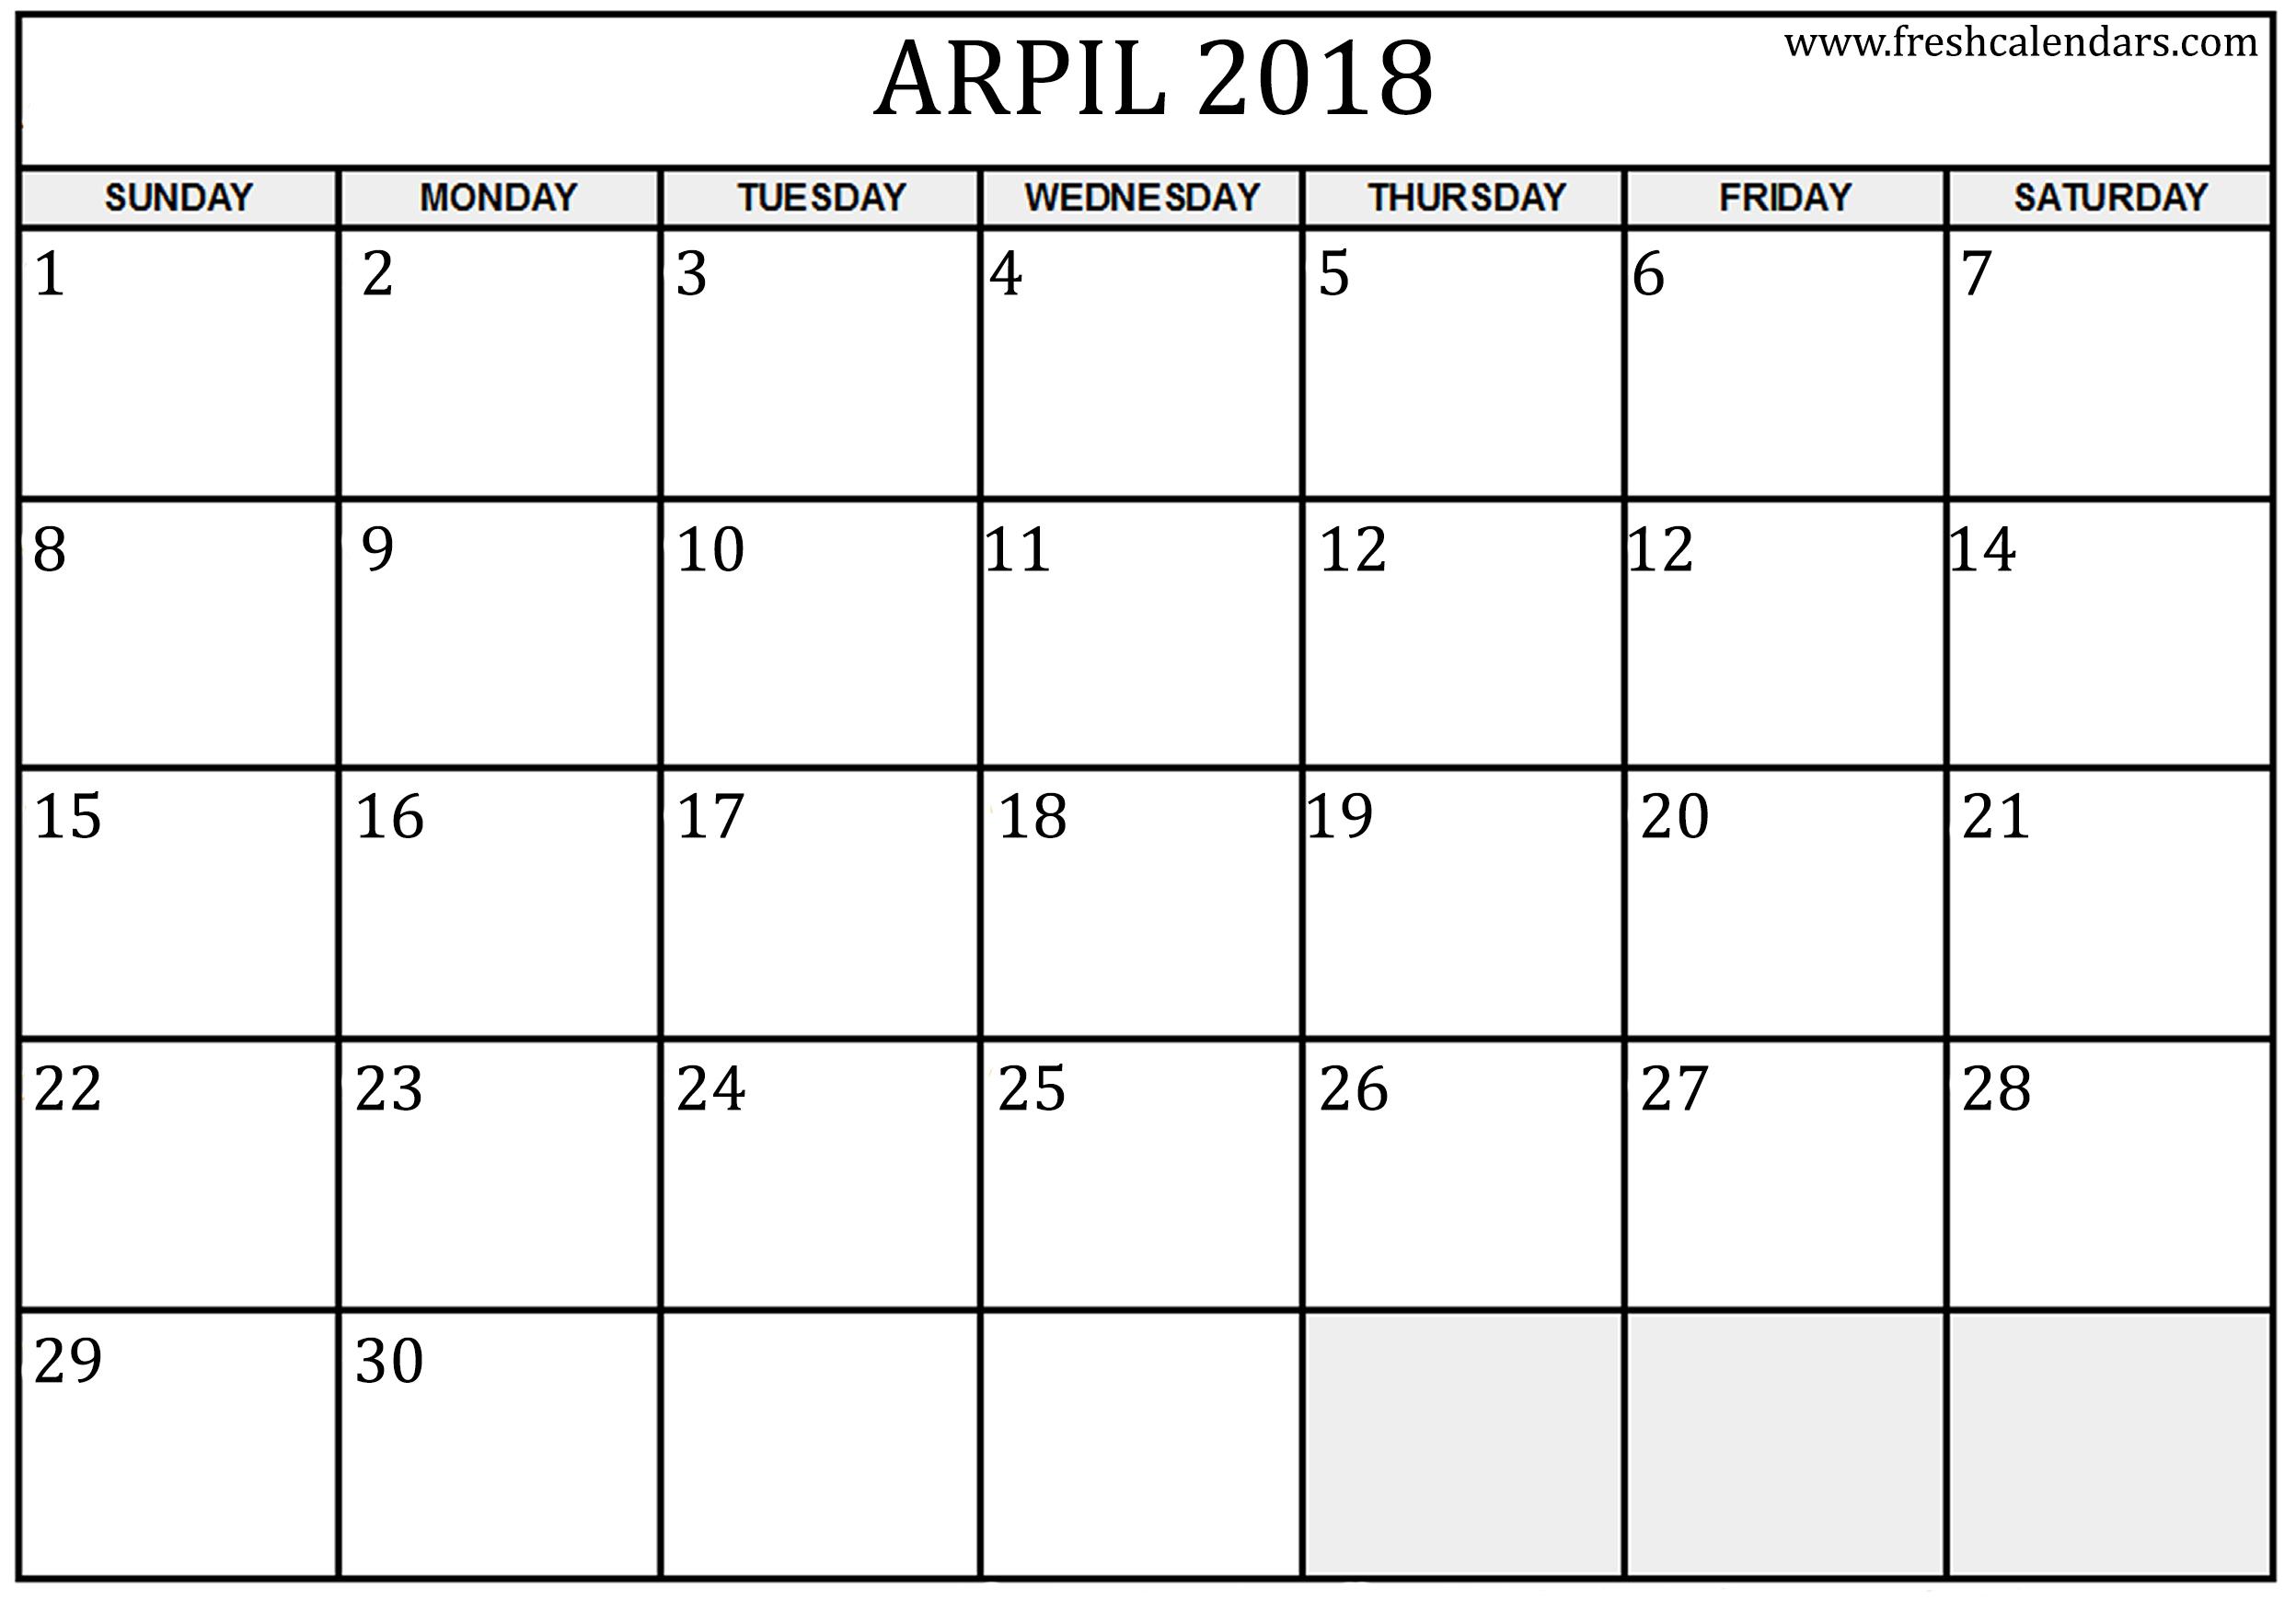 Calendar April 2018.April 2018 Calendar Printable Fresh Calendars